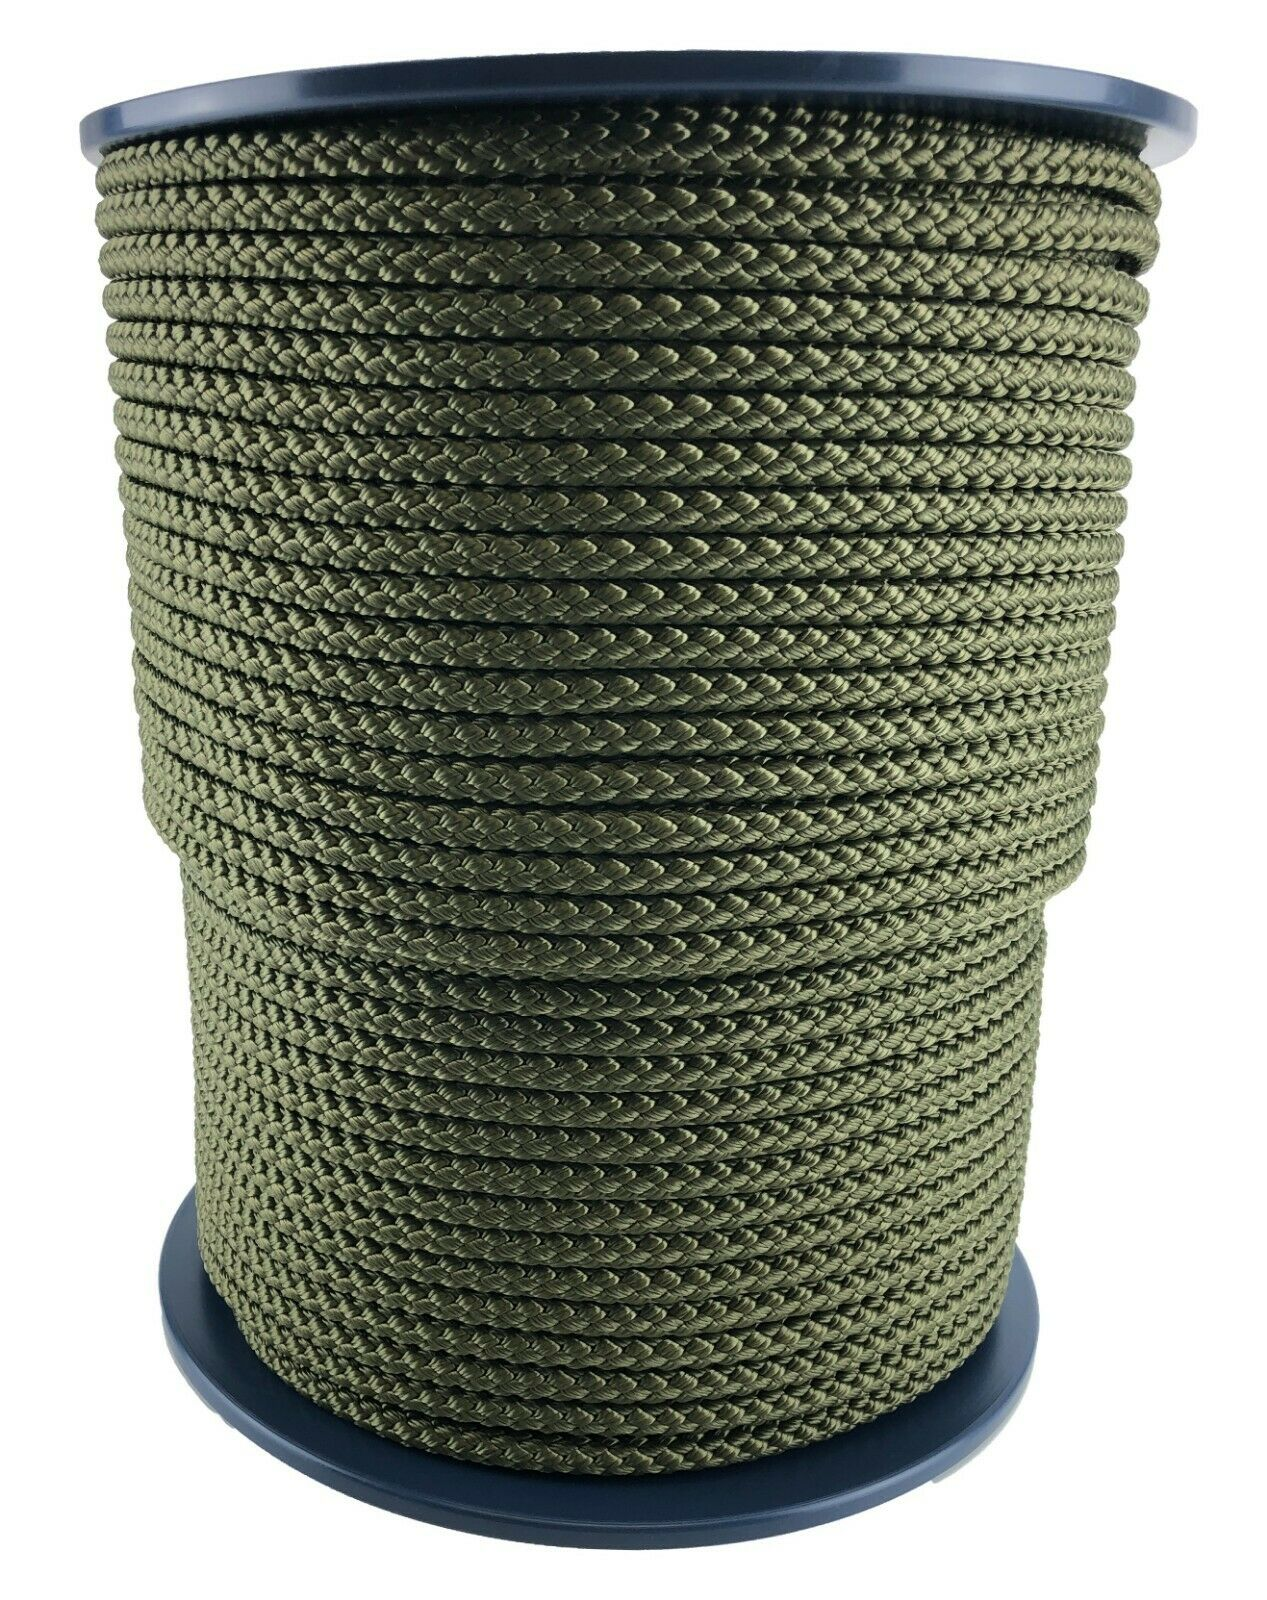 8mm Oliva Trenzado Polipropileno Polipropileno Cuerda Paracord con Cordón Vela